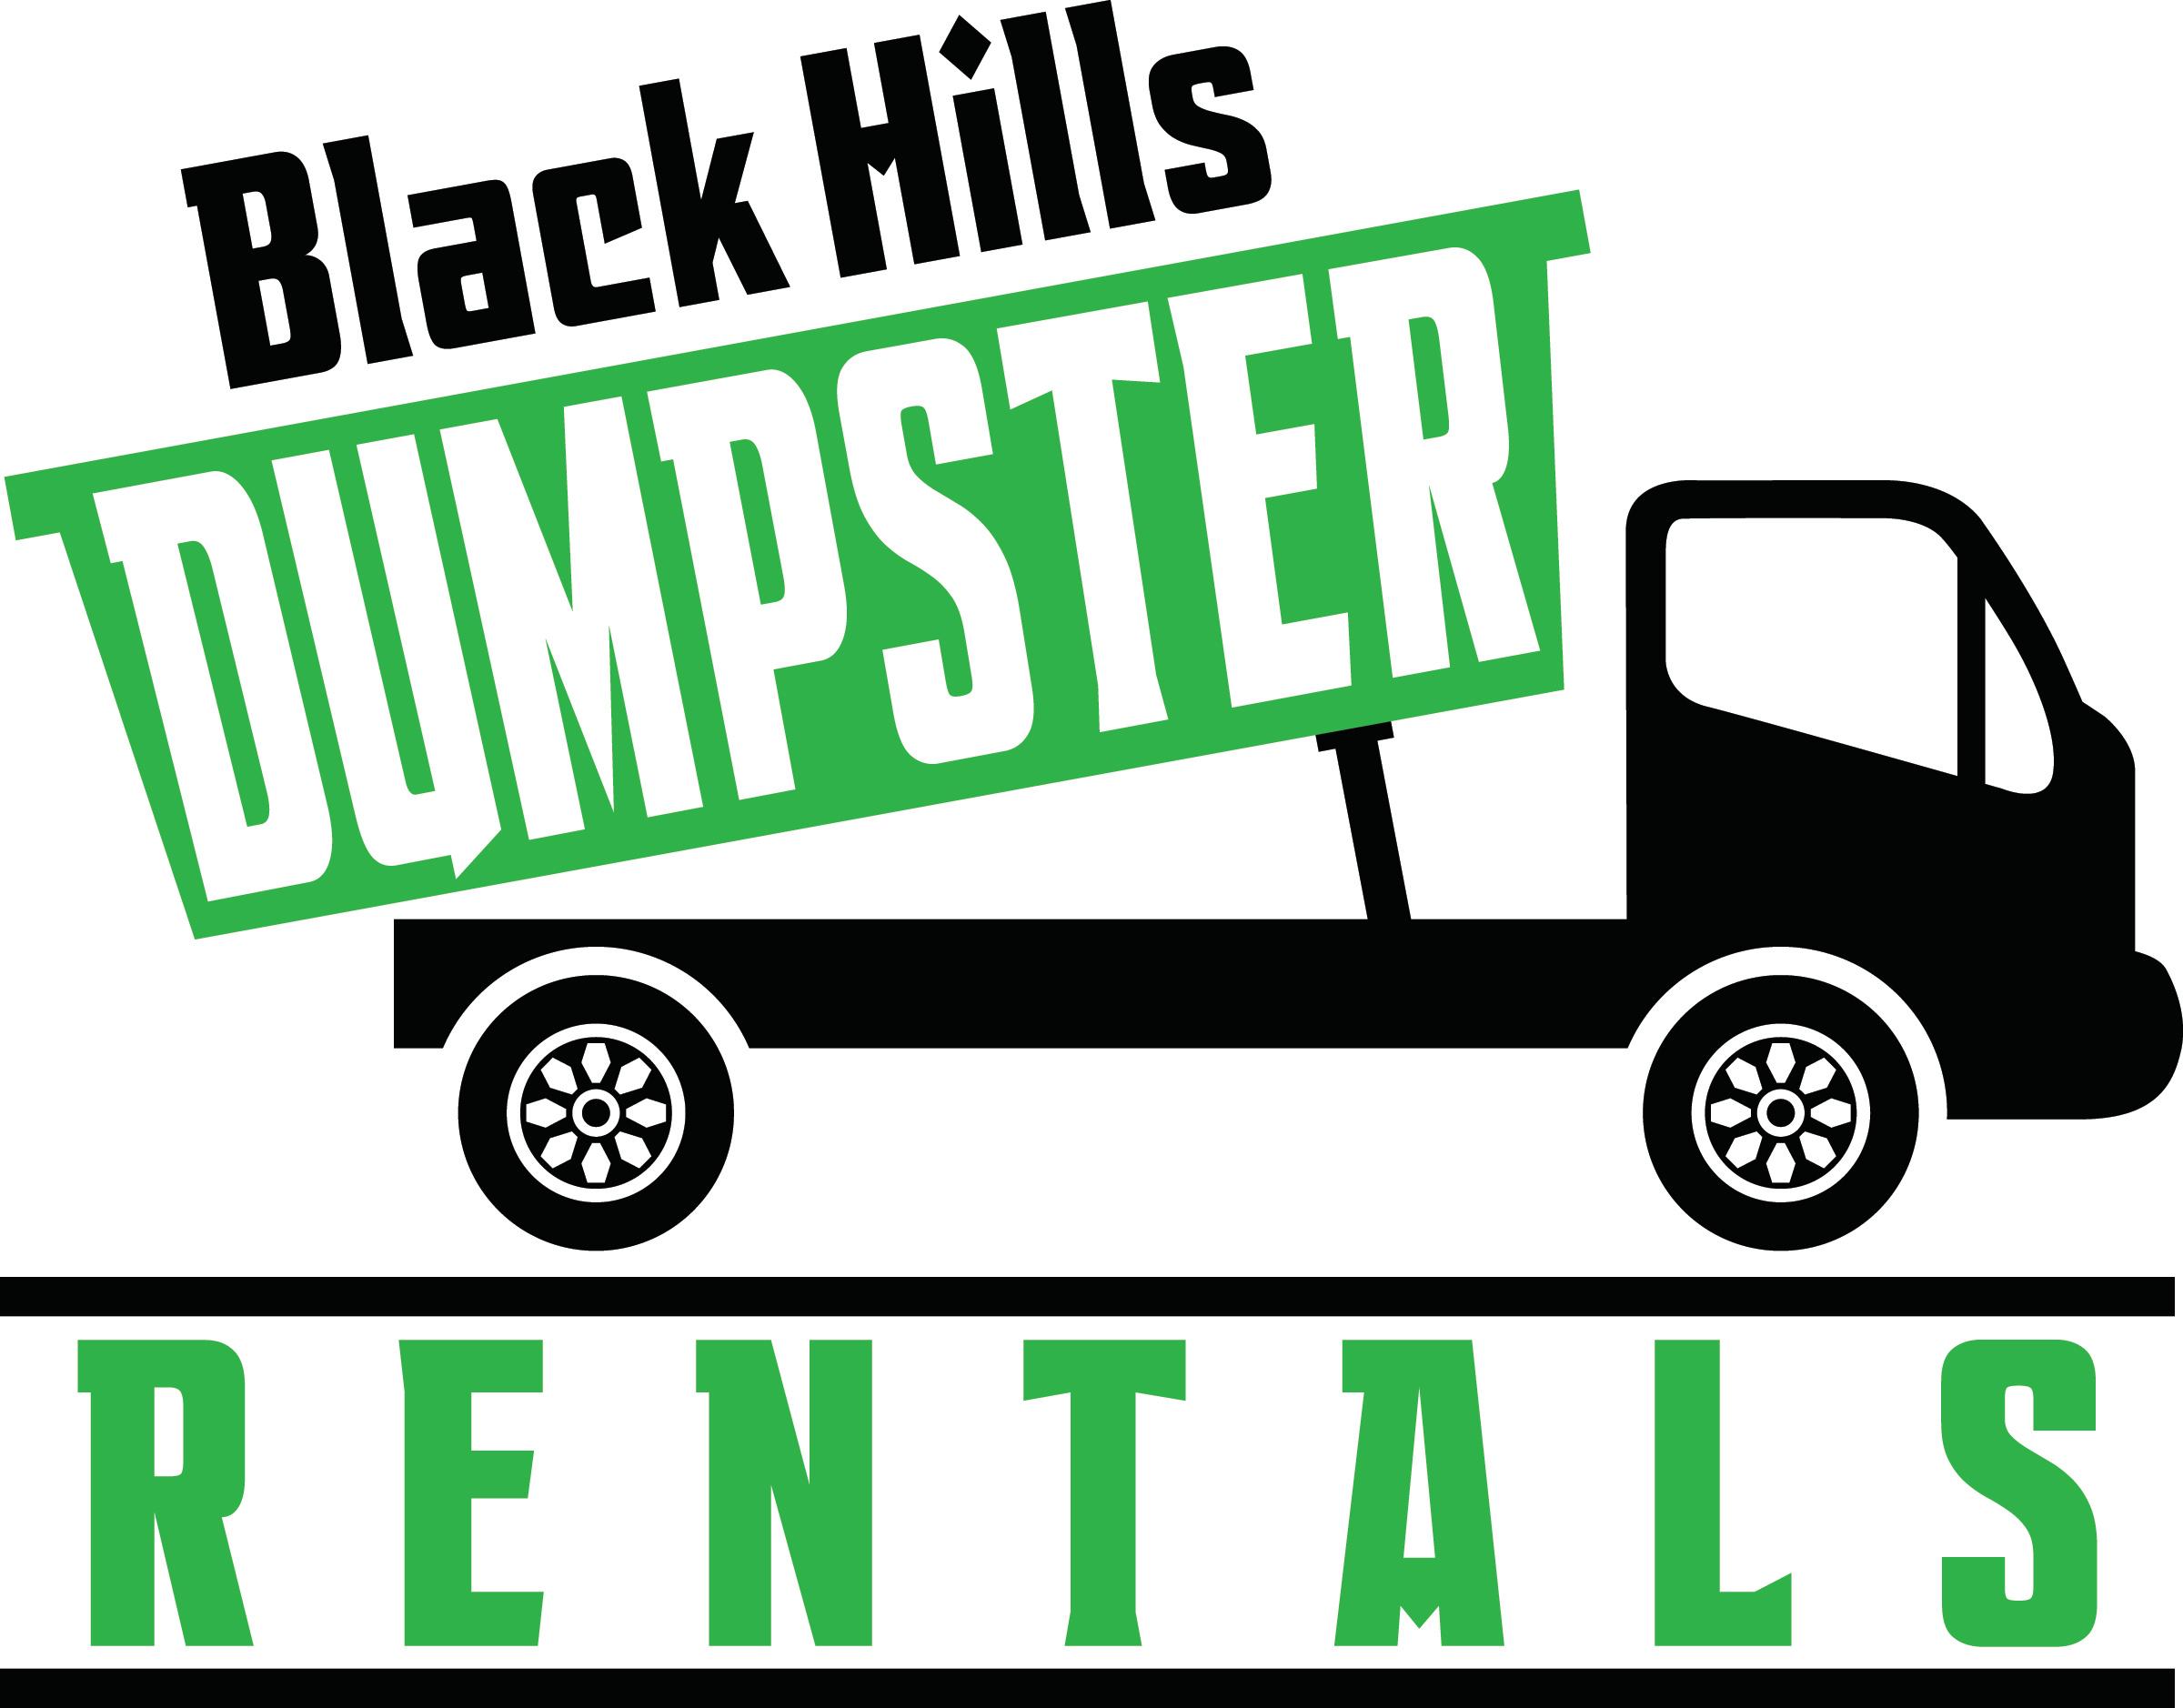 Black Hills Dumpster Rentals